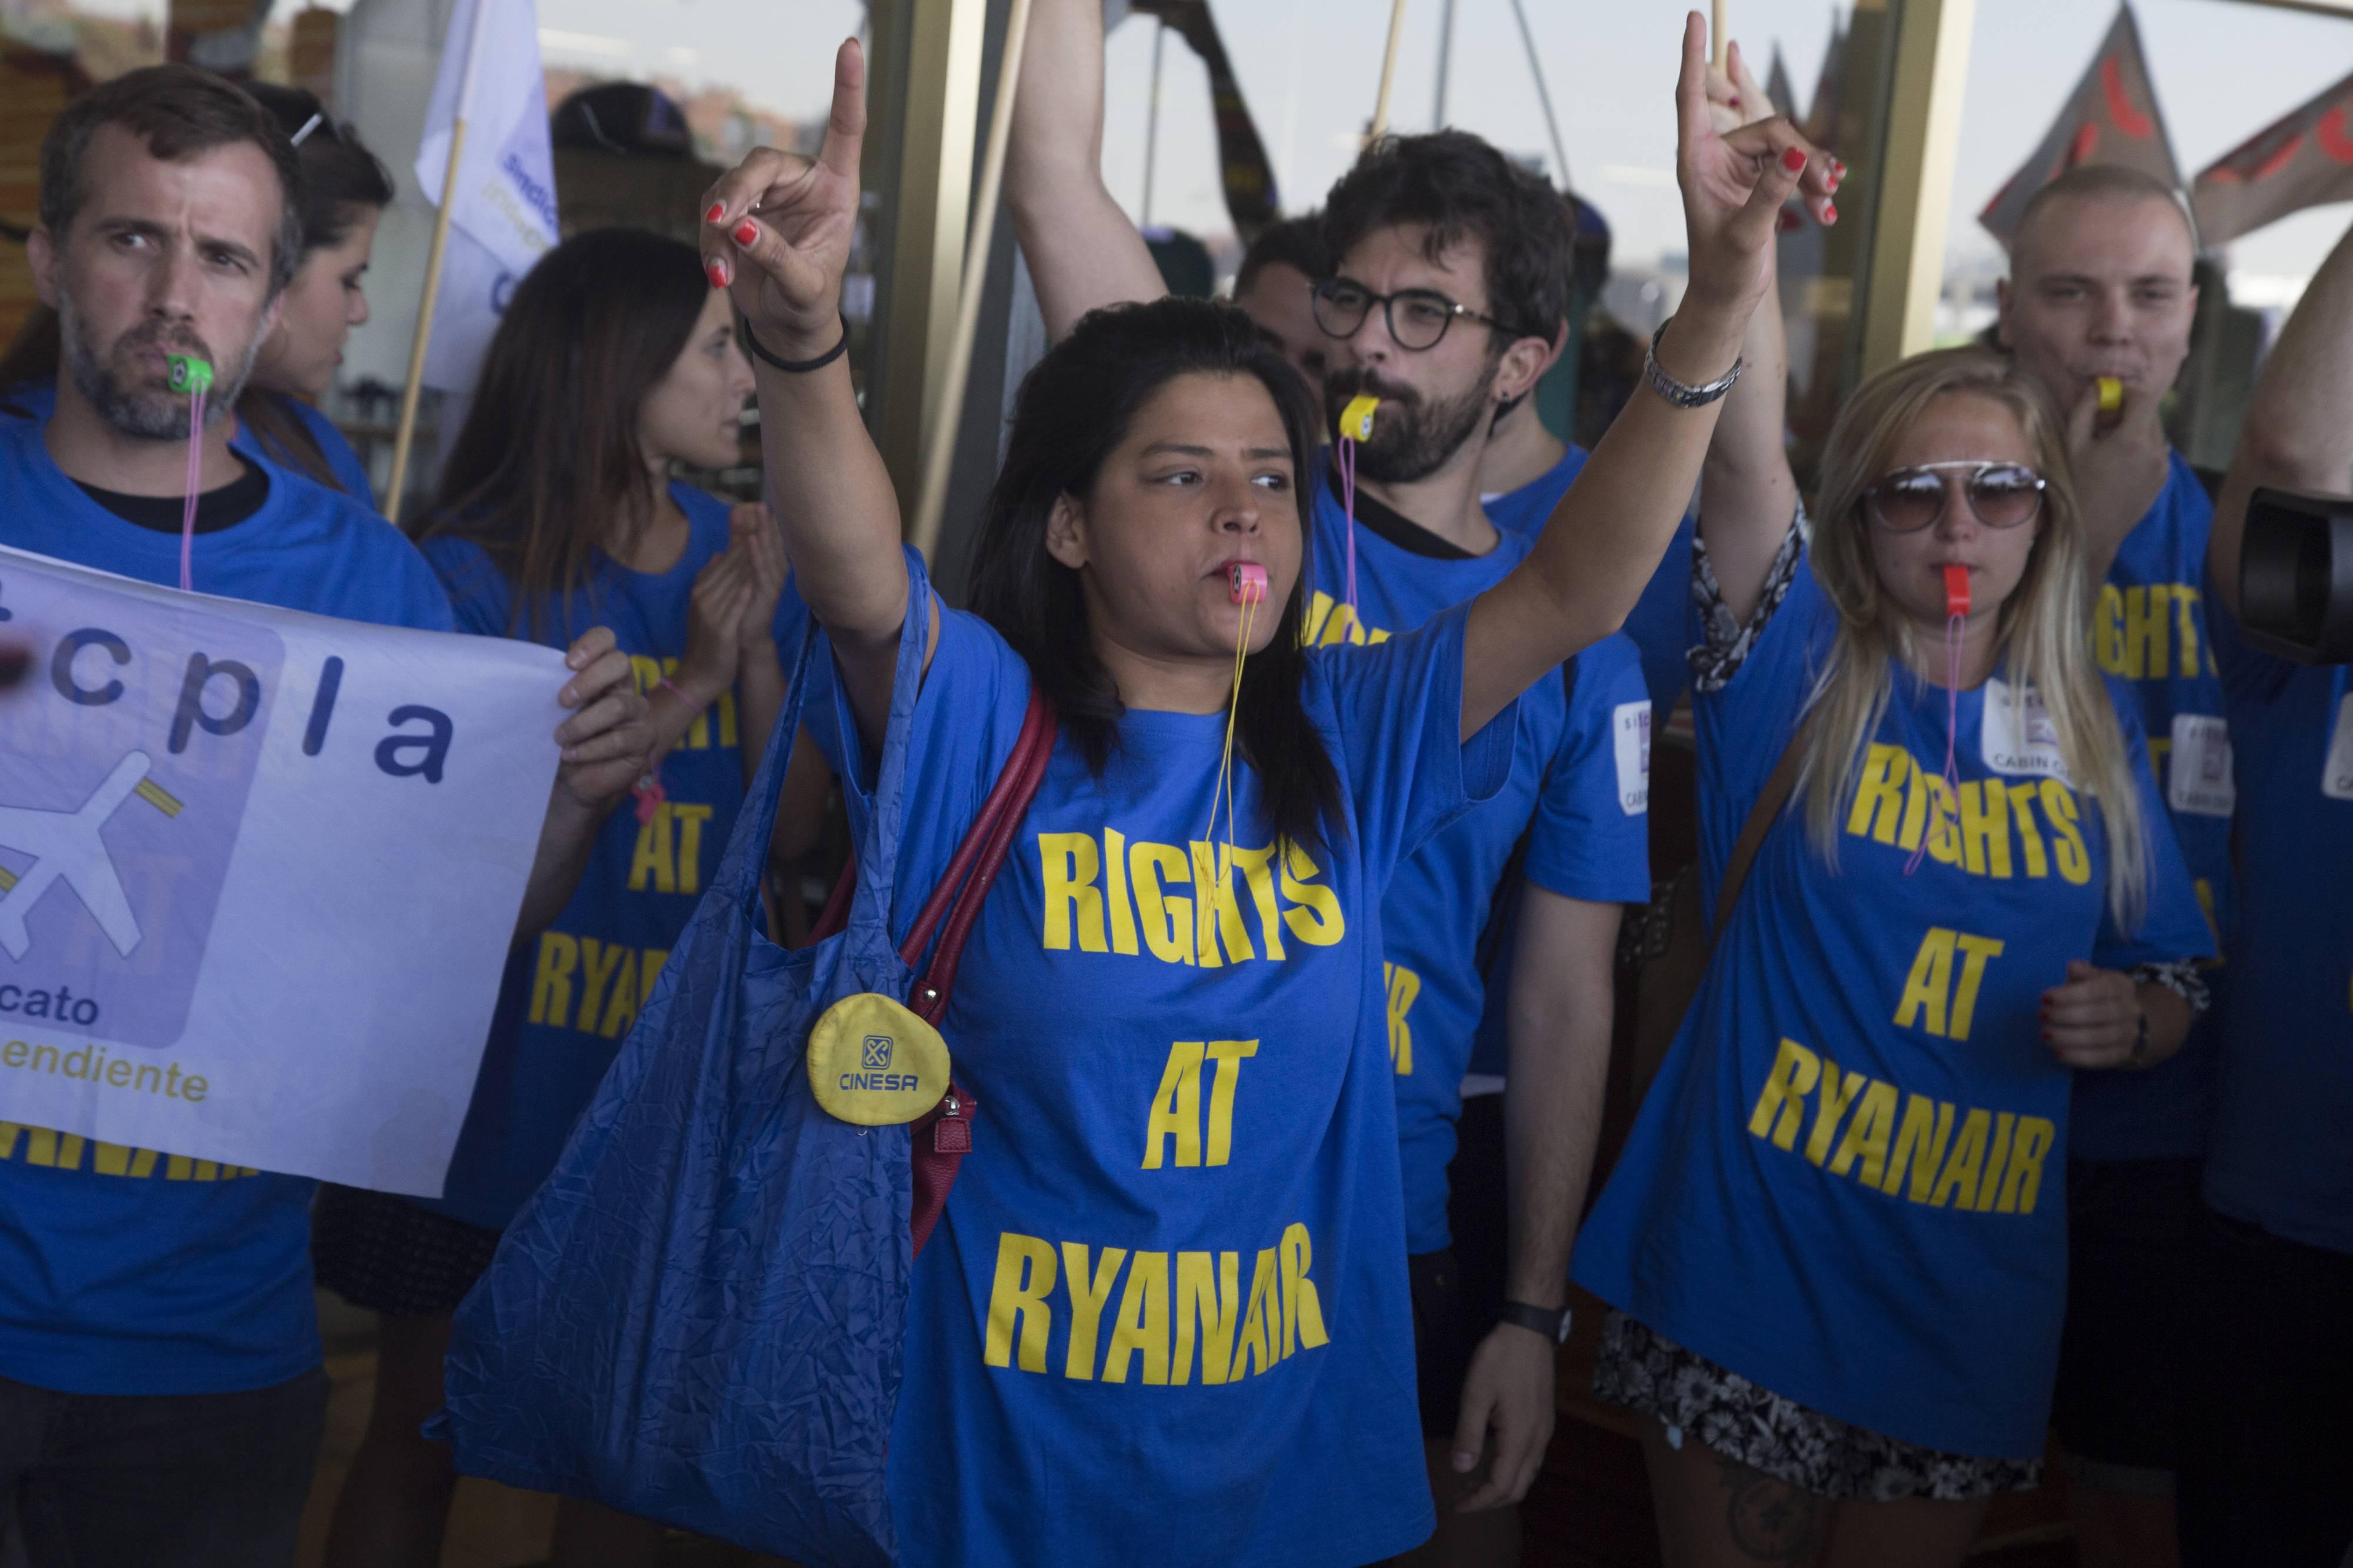 Ryanair cabin crew on strike. The protesters were demanding